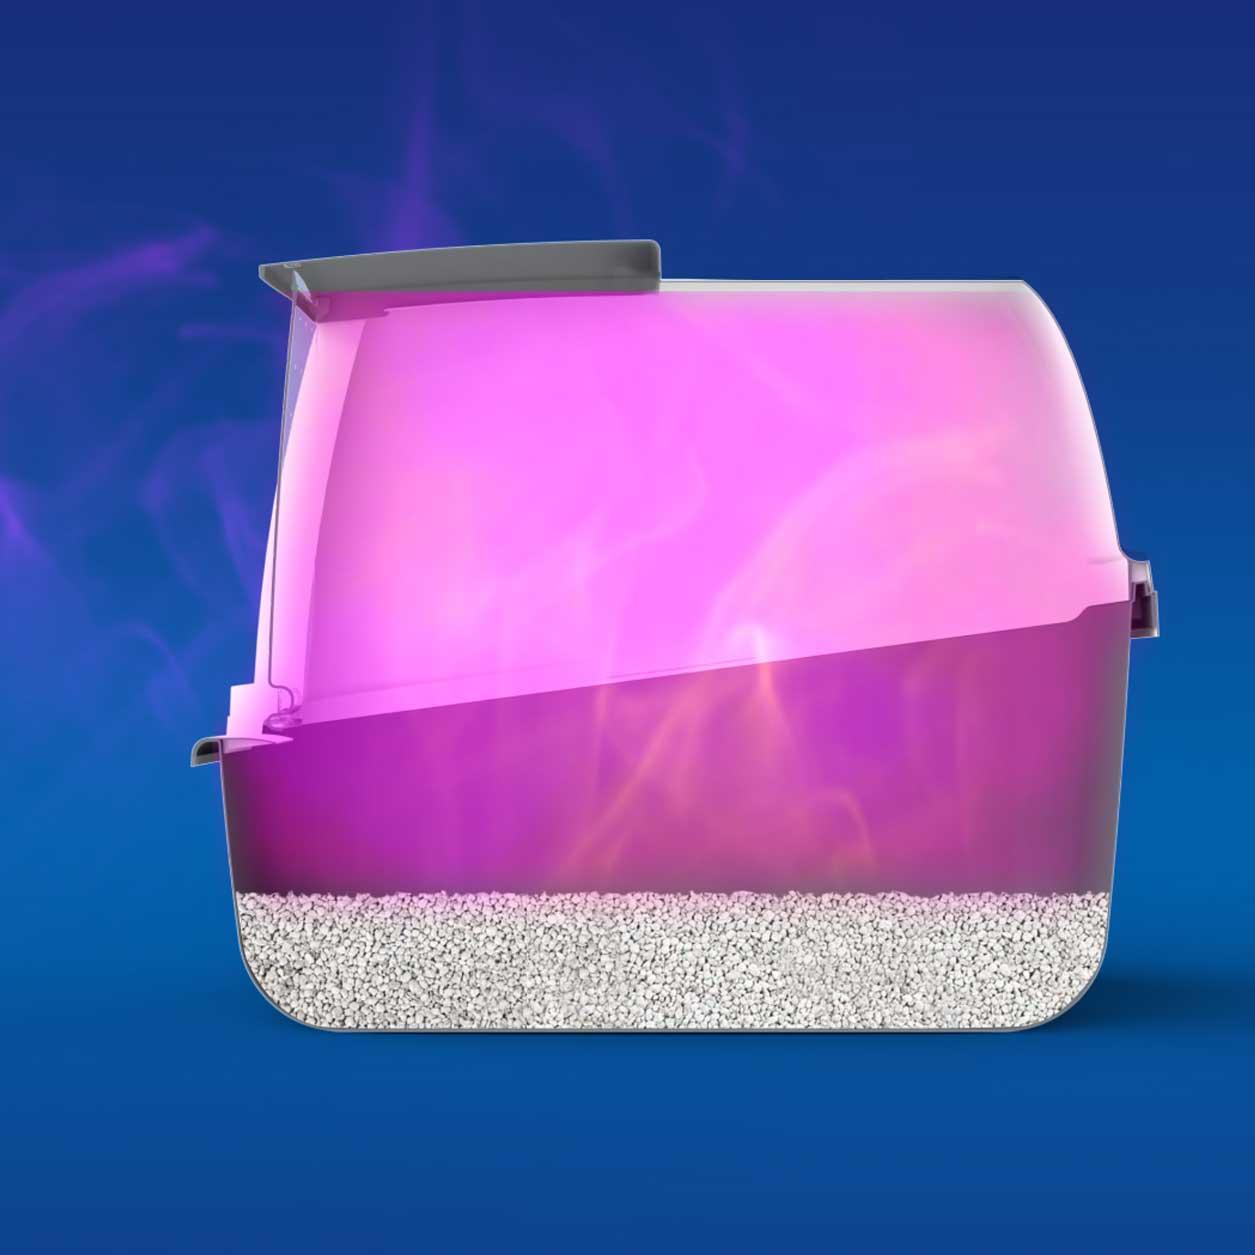 Simulation of ammonia odour in a catpen